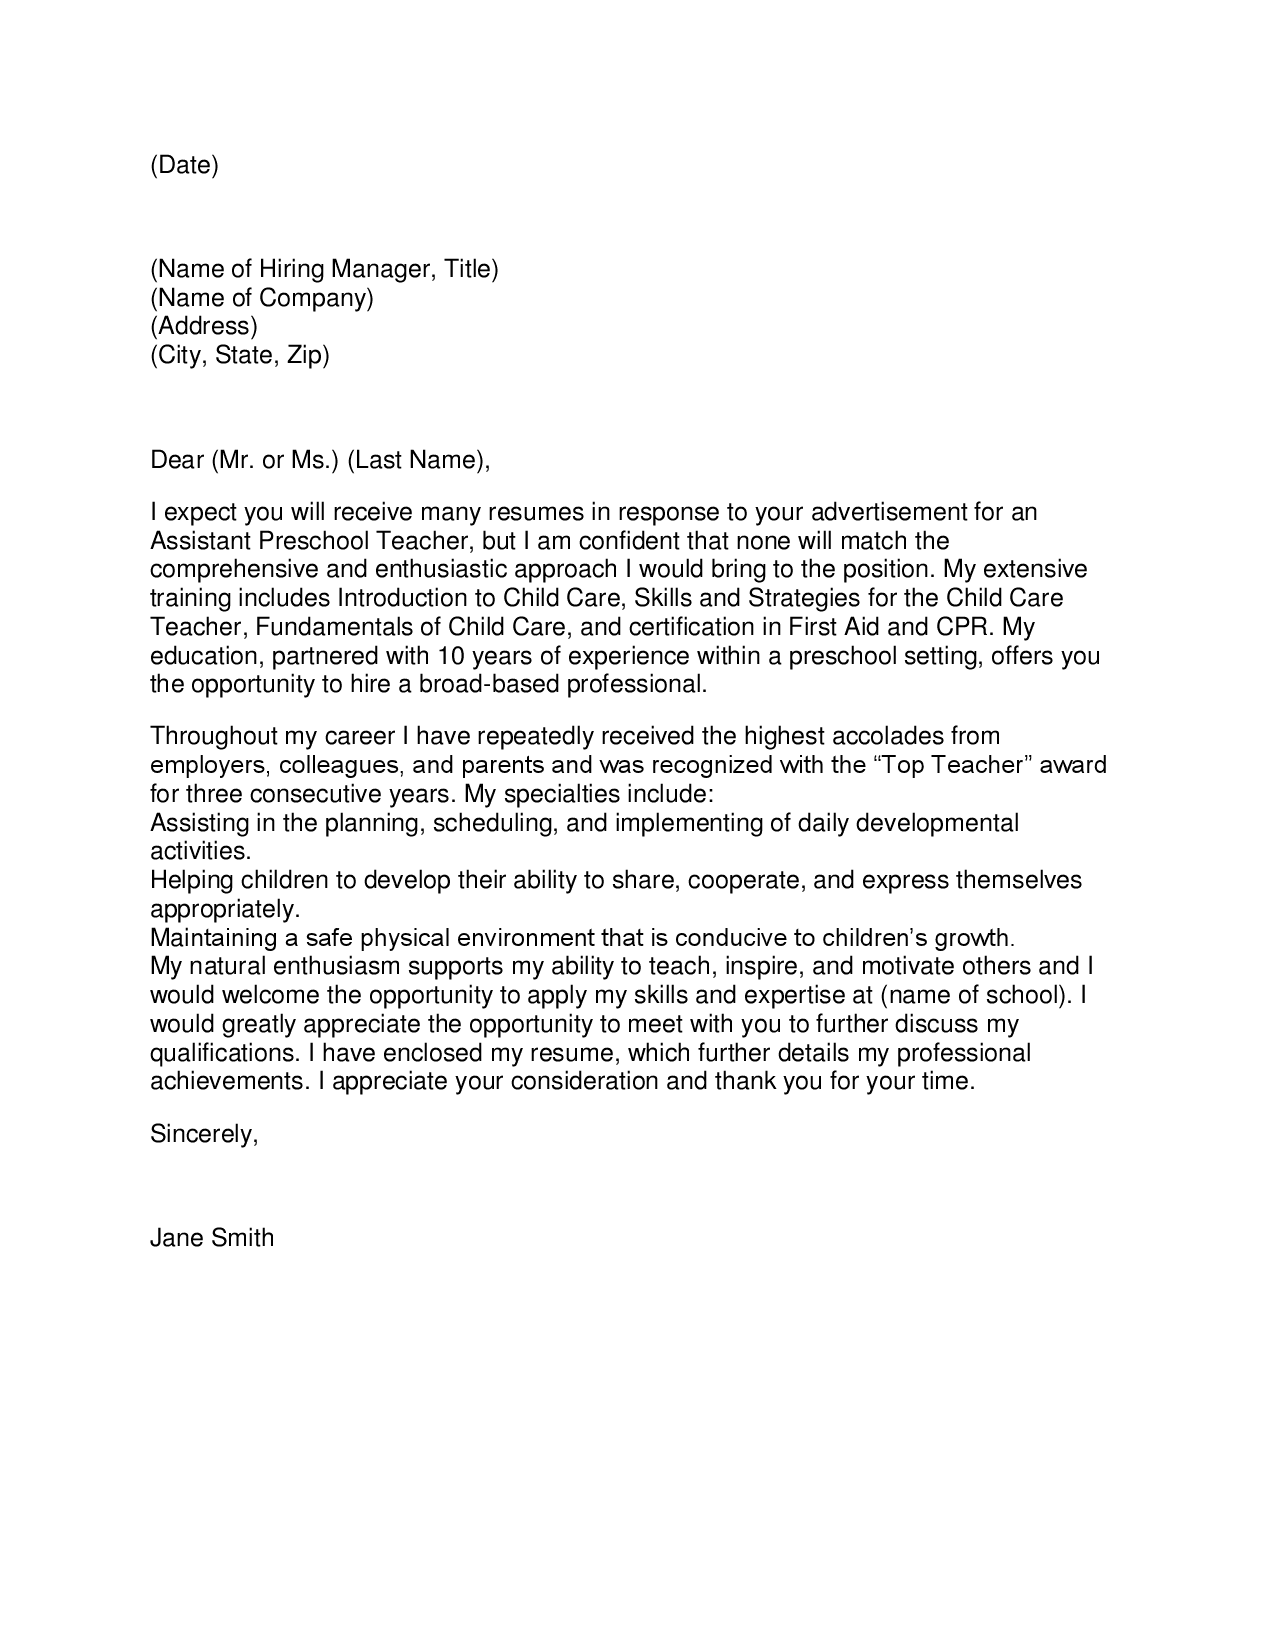 sample cover letter academic job application best custom paper writing services georgia farm